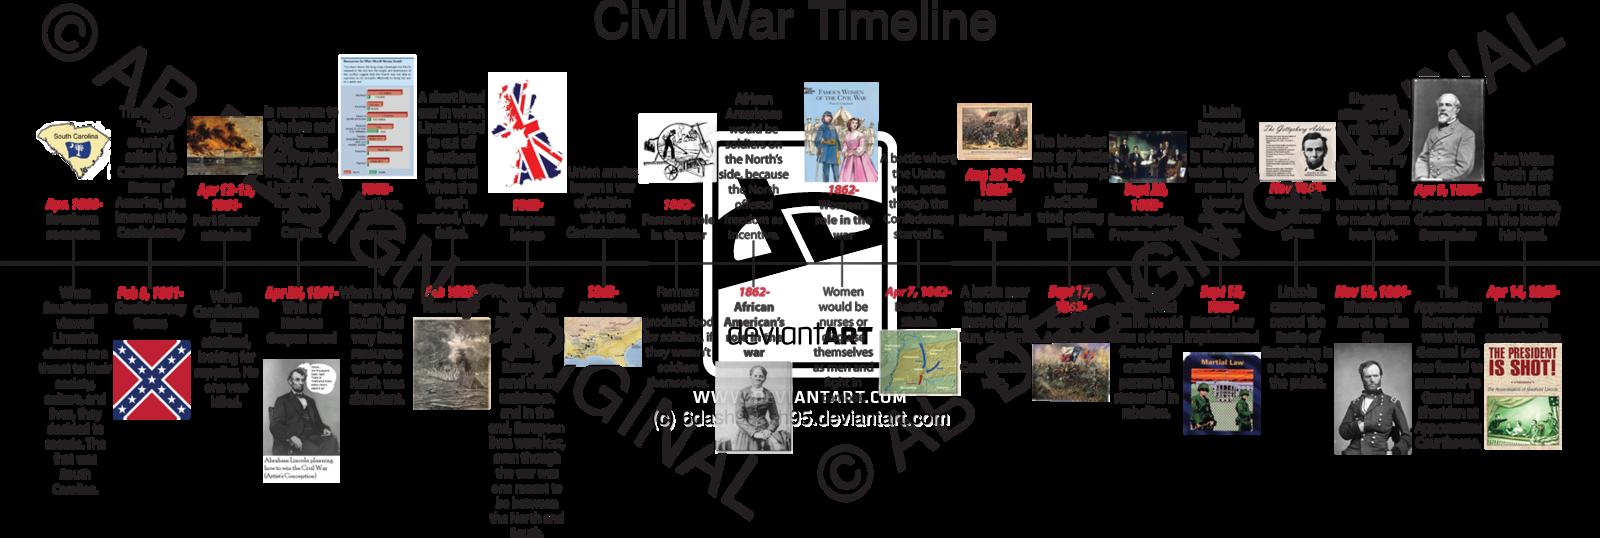 pin by jenn wood on civil war timeline homework civil war activities